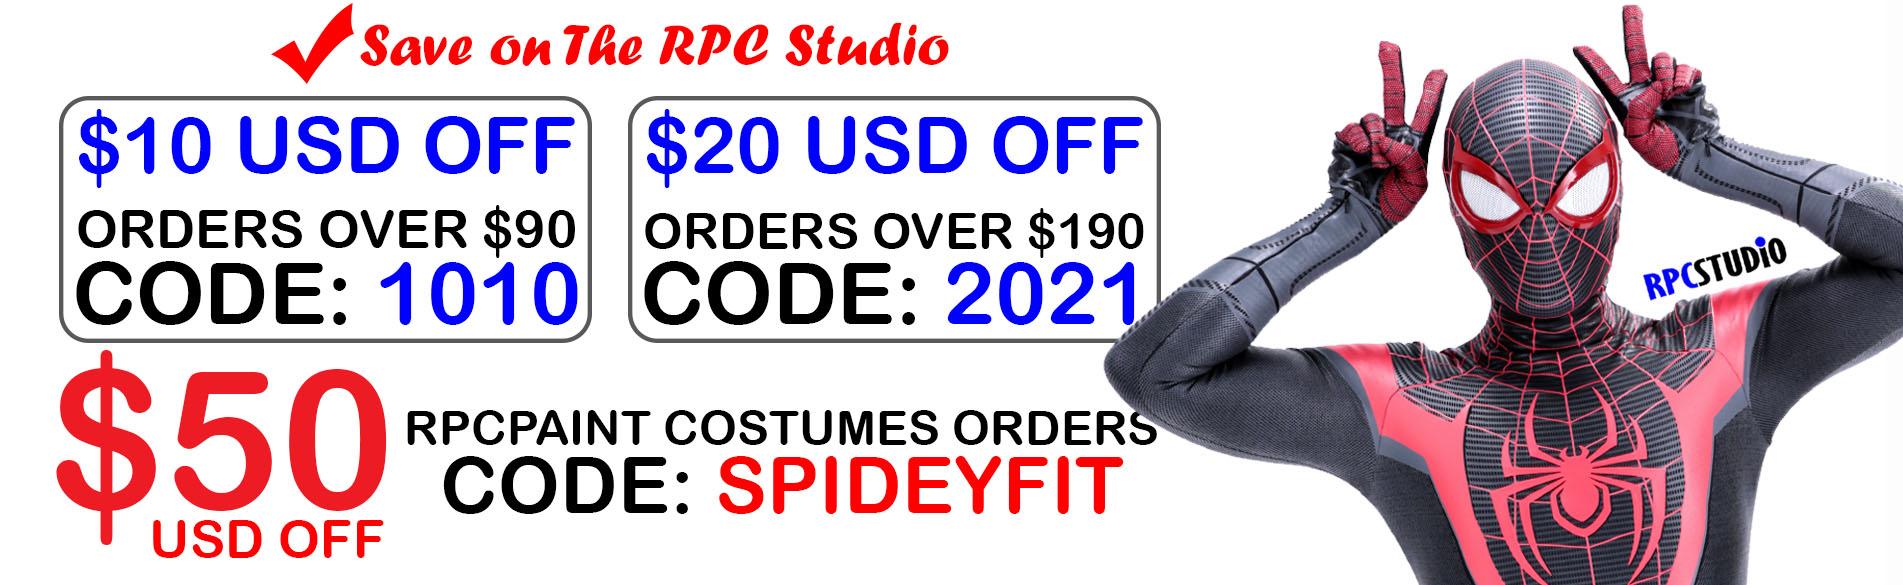 Save On The RPC Studio